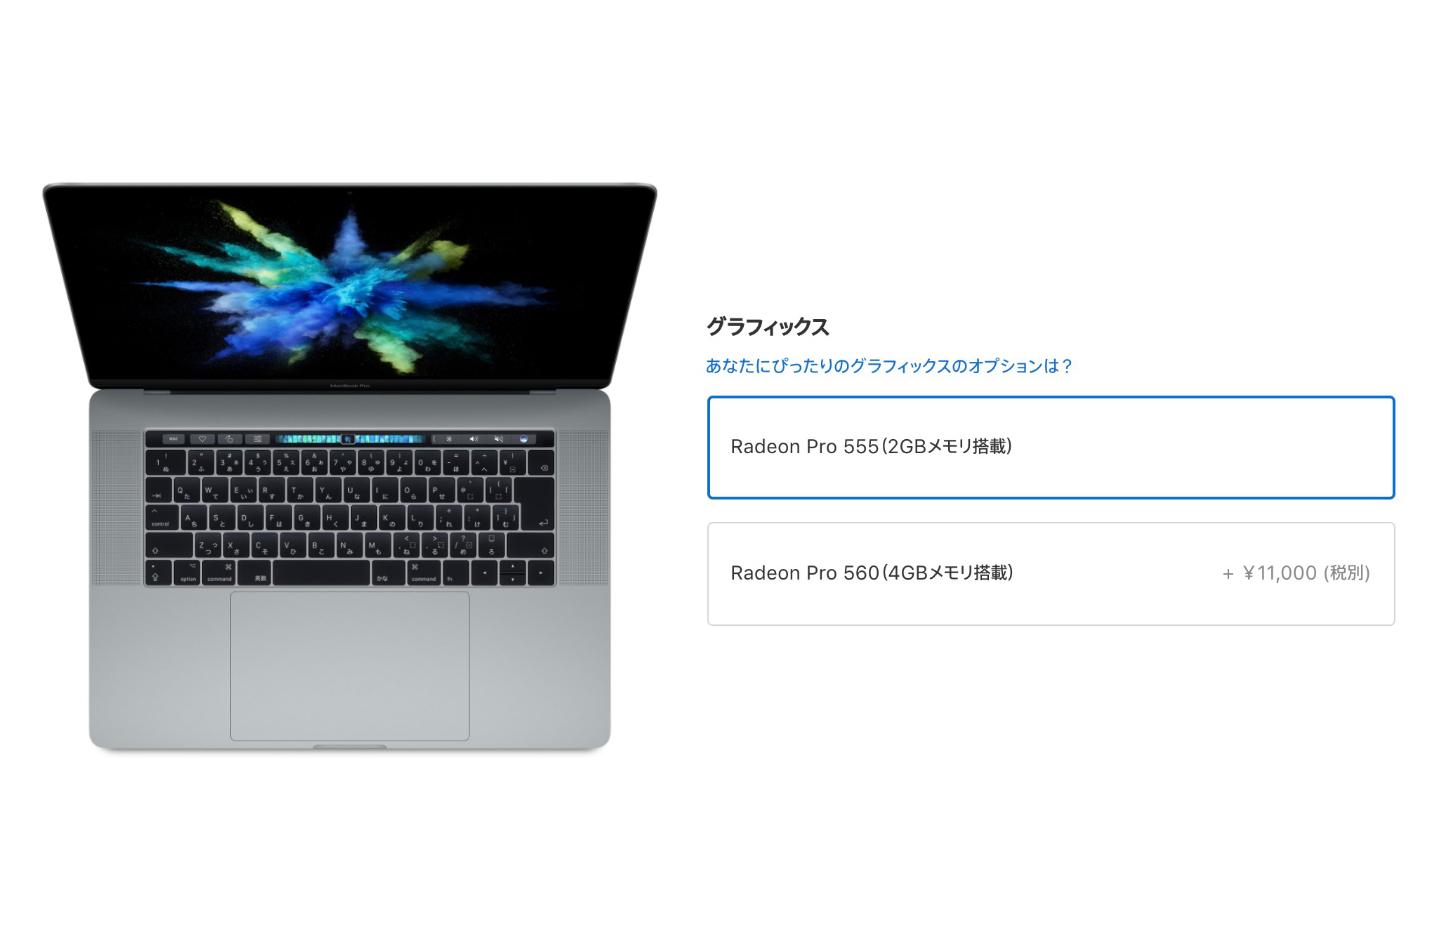 MacBook-Pro-Choosing-the-right-GPU.jpg